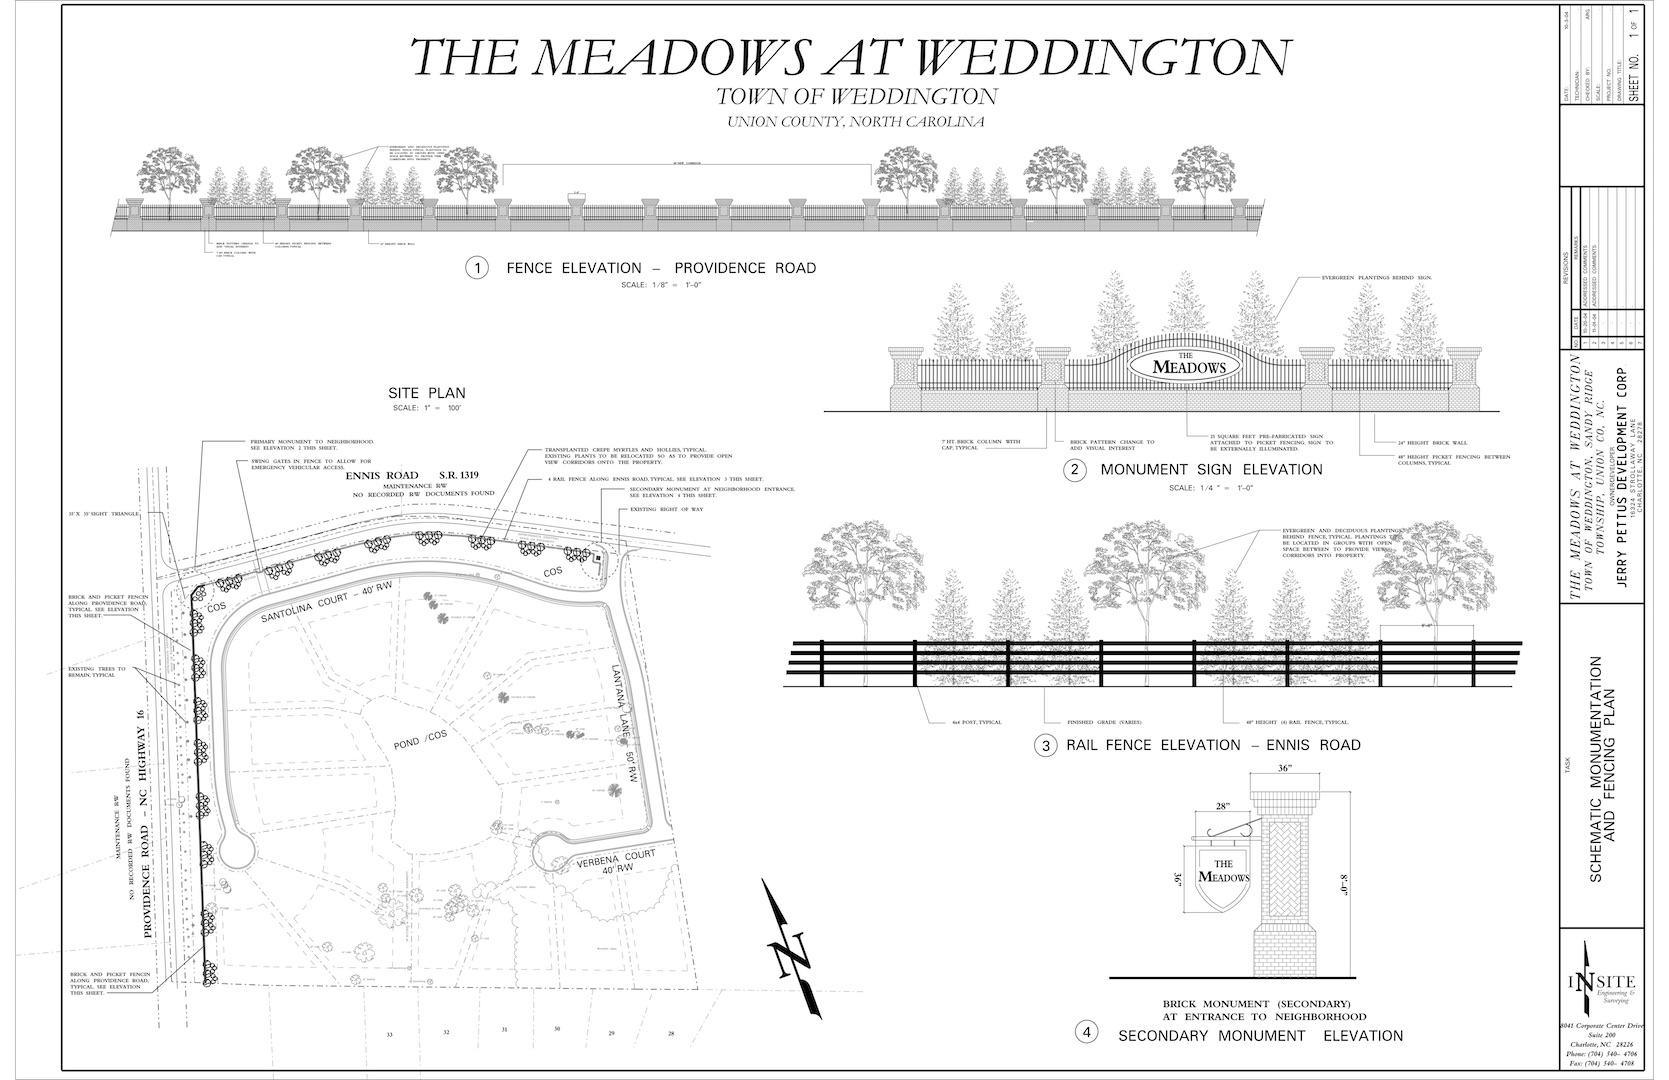 REAL - Meadows at Weddington Monumentation Plan2-7-05.jpg